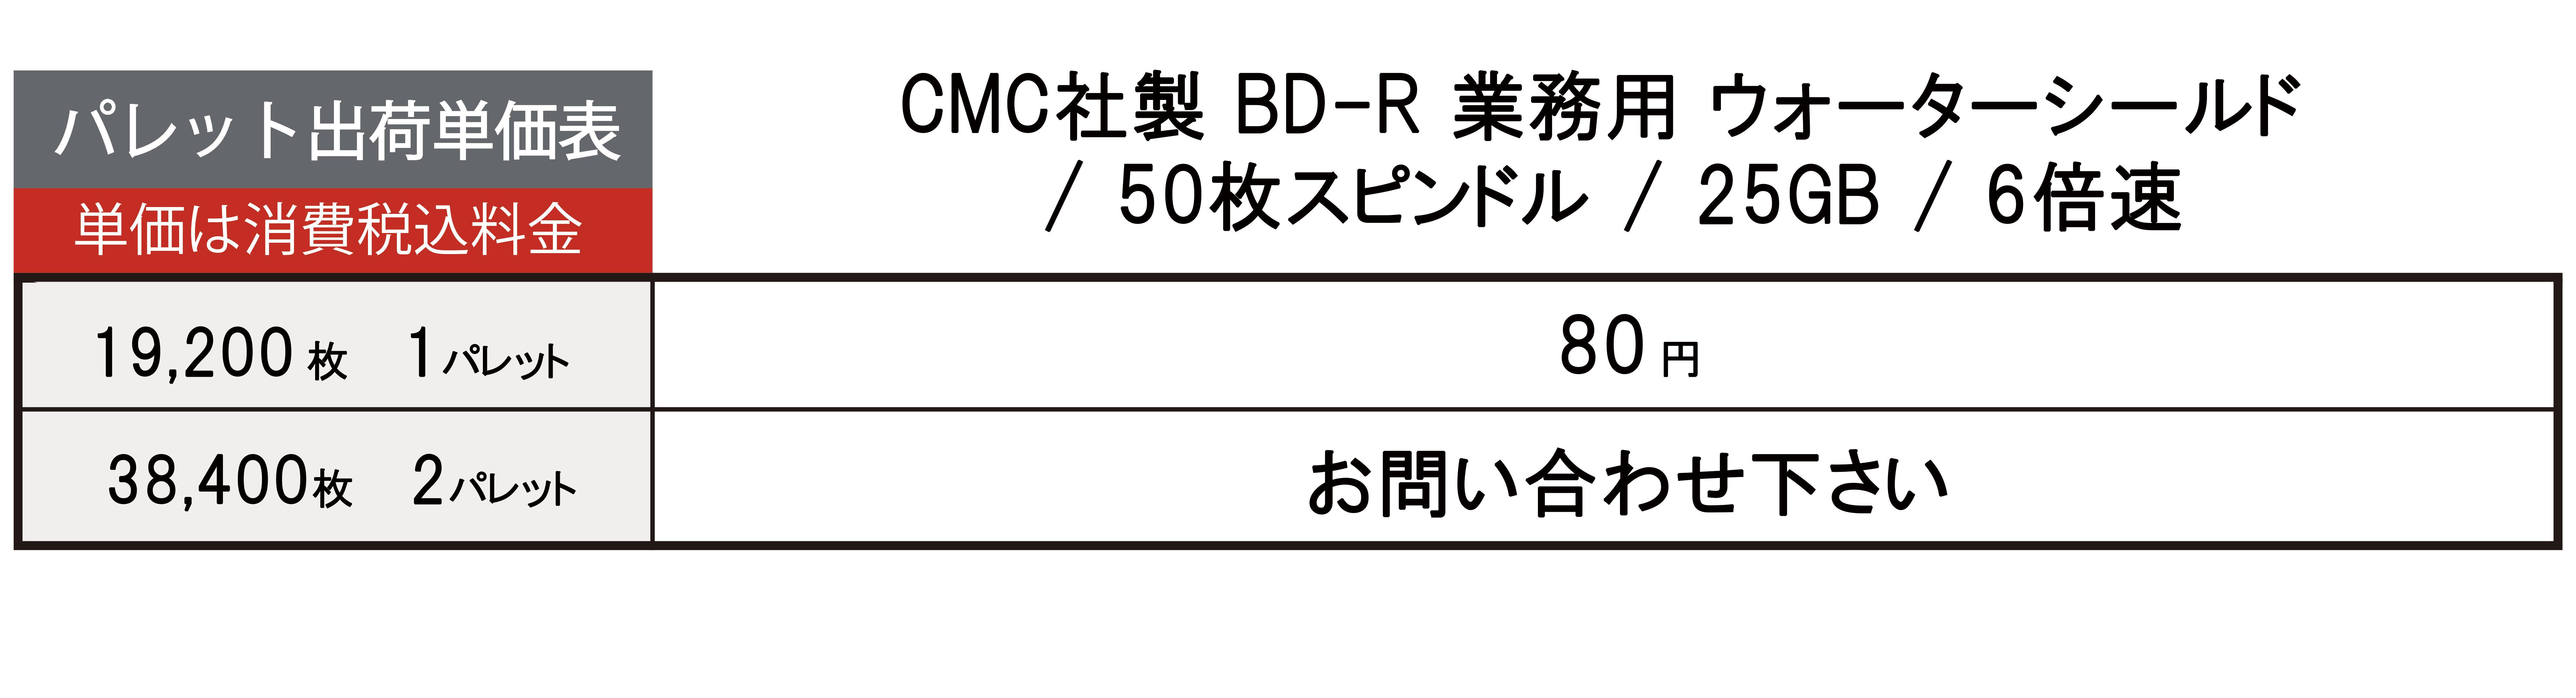 BDケース大量注文